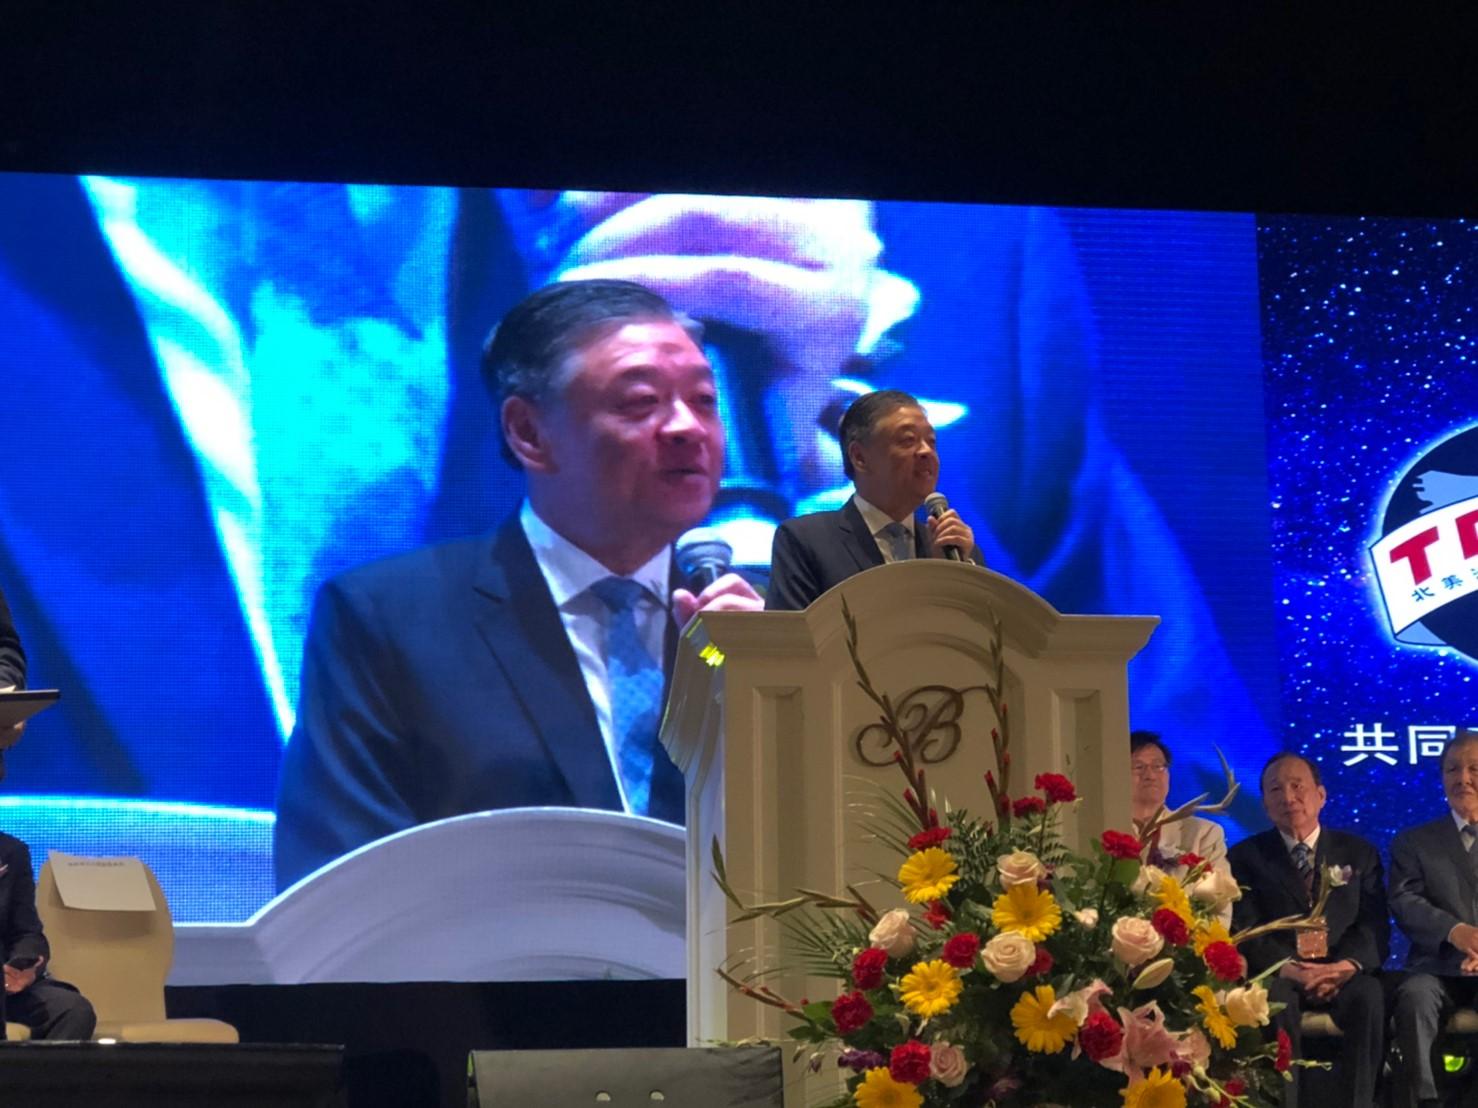 Vice Minister of the Overseas Community Affairs Council -Roy Leu 僑務委員會副委員長 呂元榮